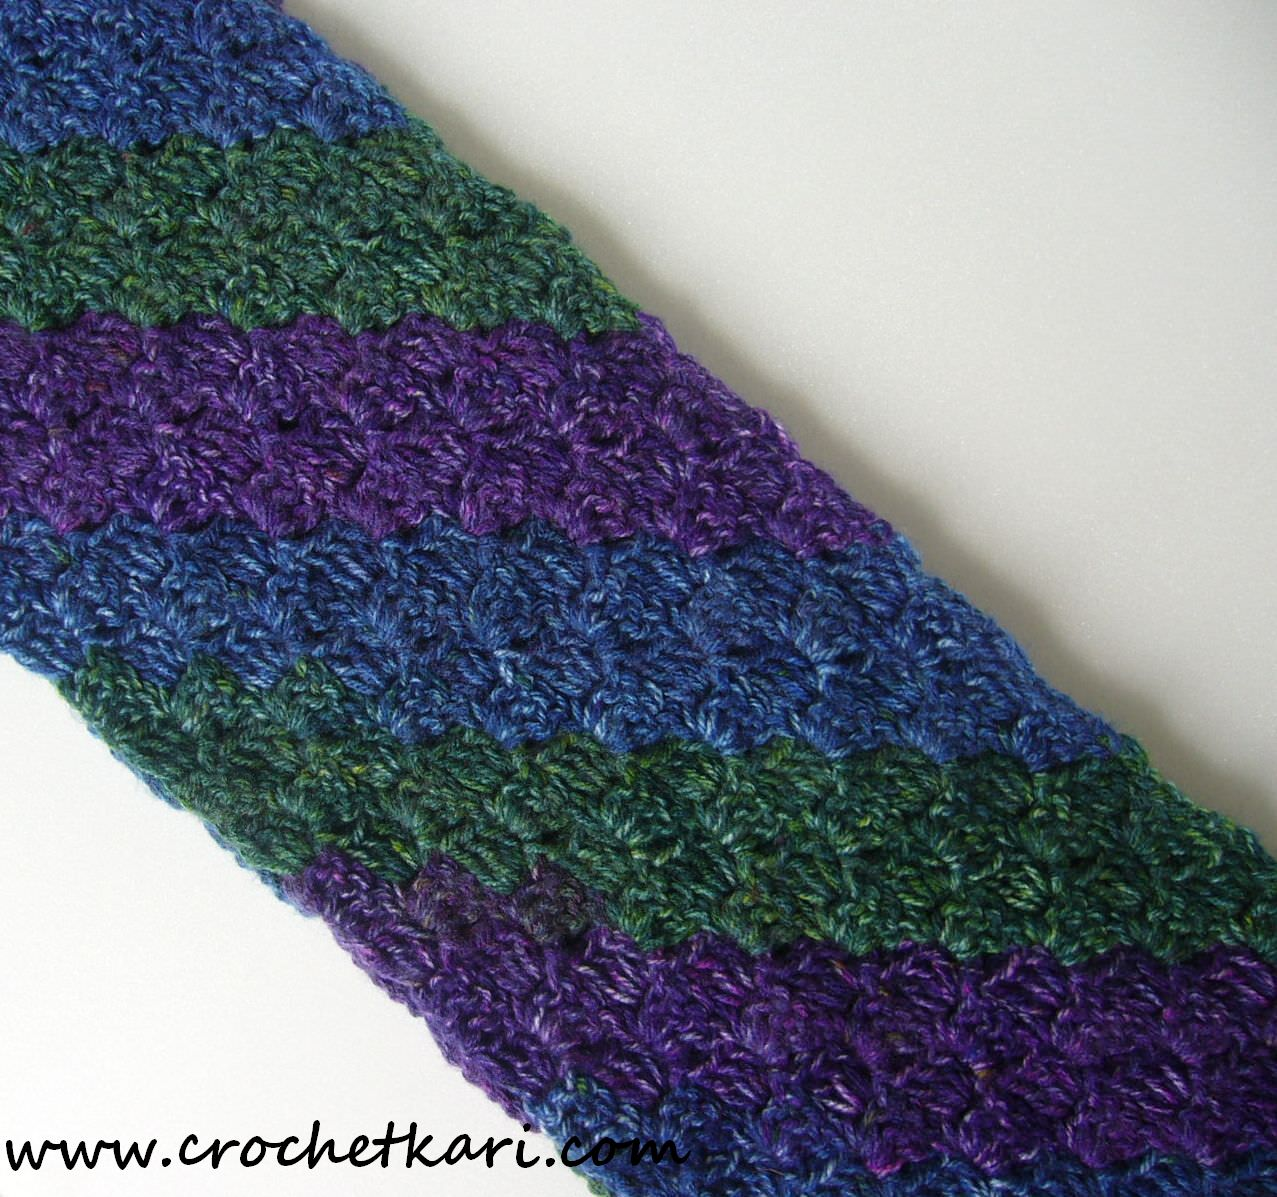 Crochetkari: Crochet C2C scarf